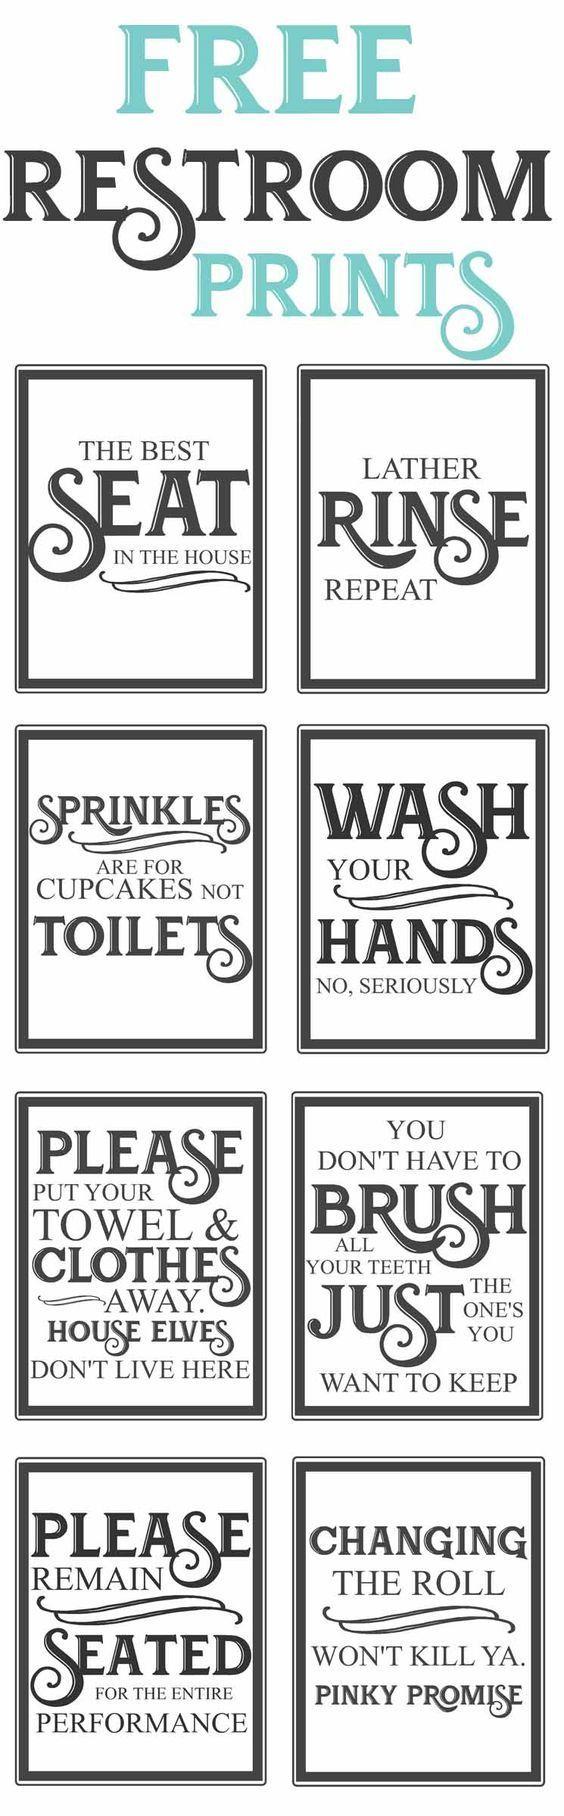 Bathroom Sign Sayings free vintage bathroom printables | funny quotes, vintage inspired